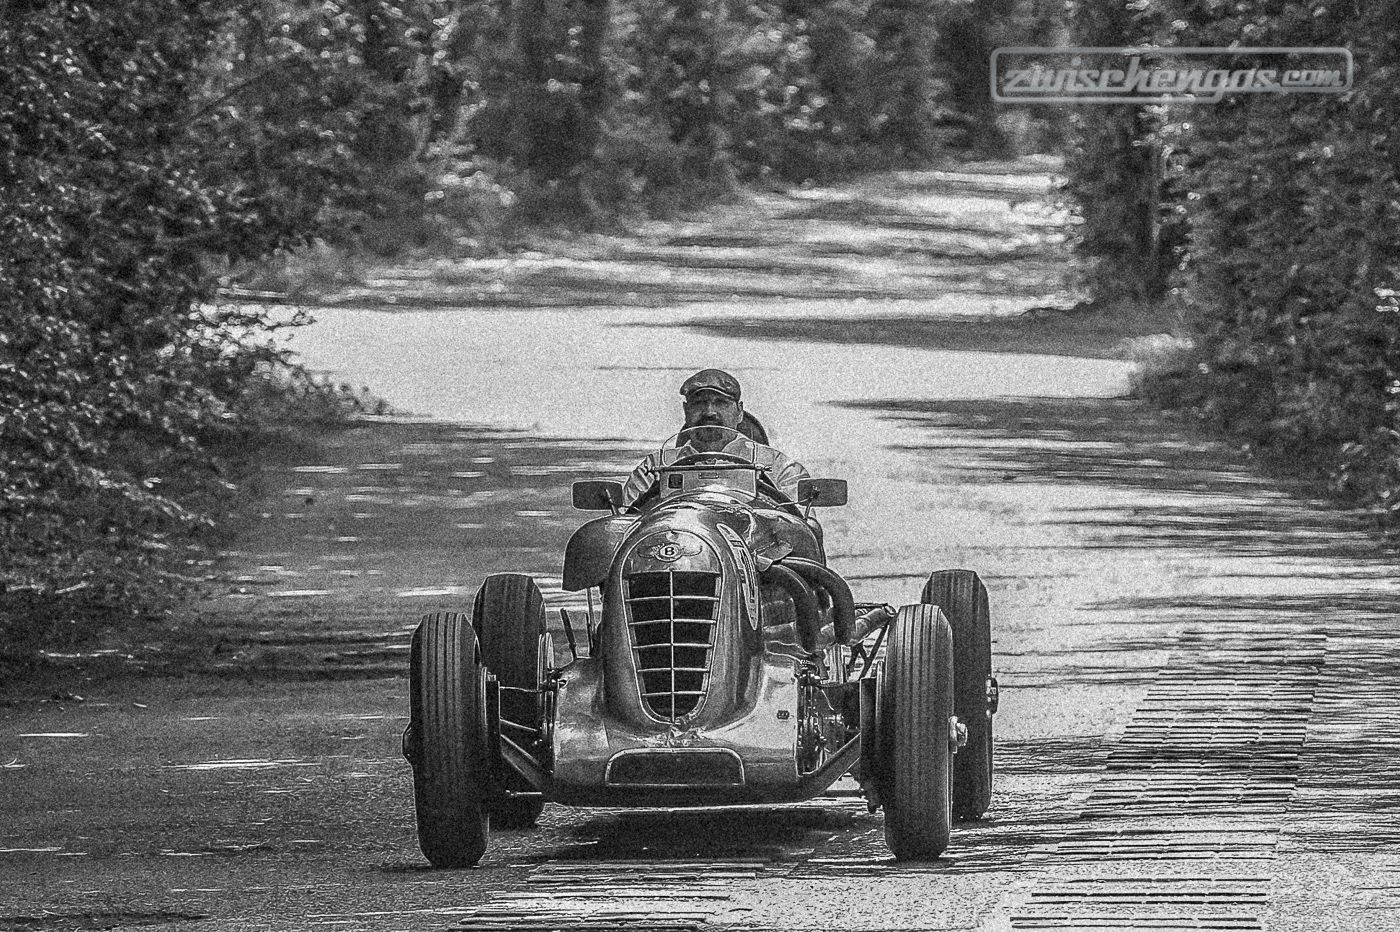 Pin Auf Oldtimer Youngtimer Klassiker Alte Autos